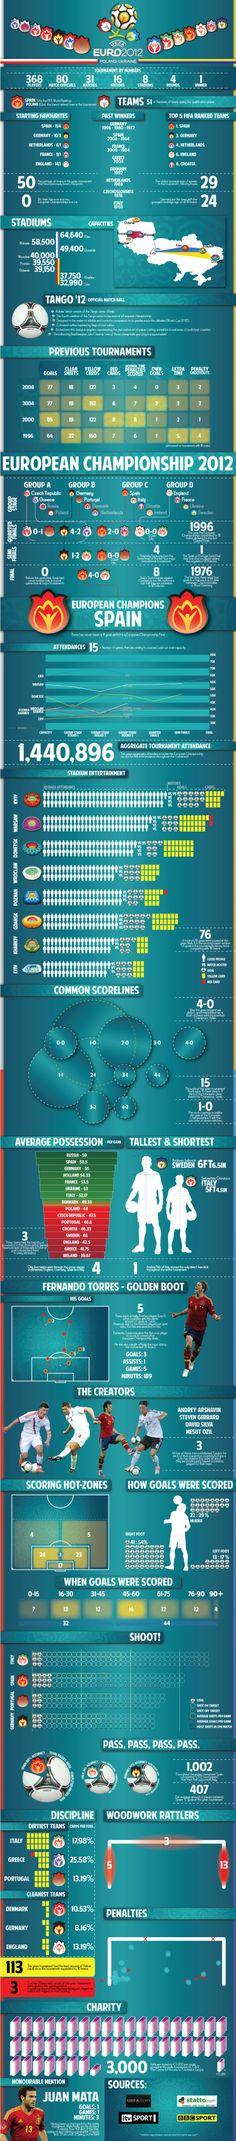 European Championship 2012 [INFOGRAPHIC] #Euro12#soccer